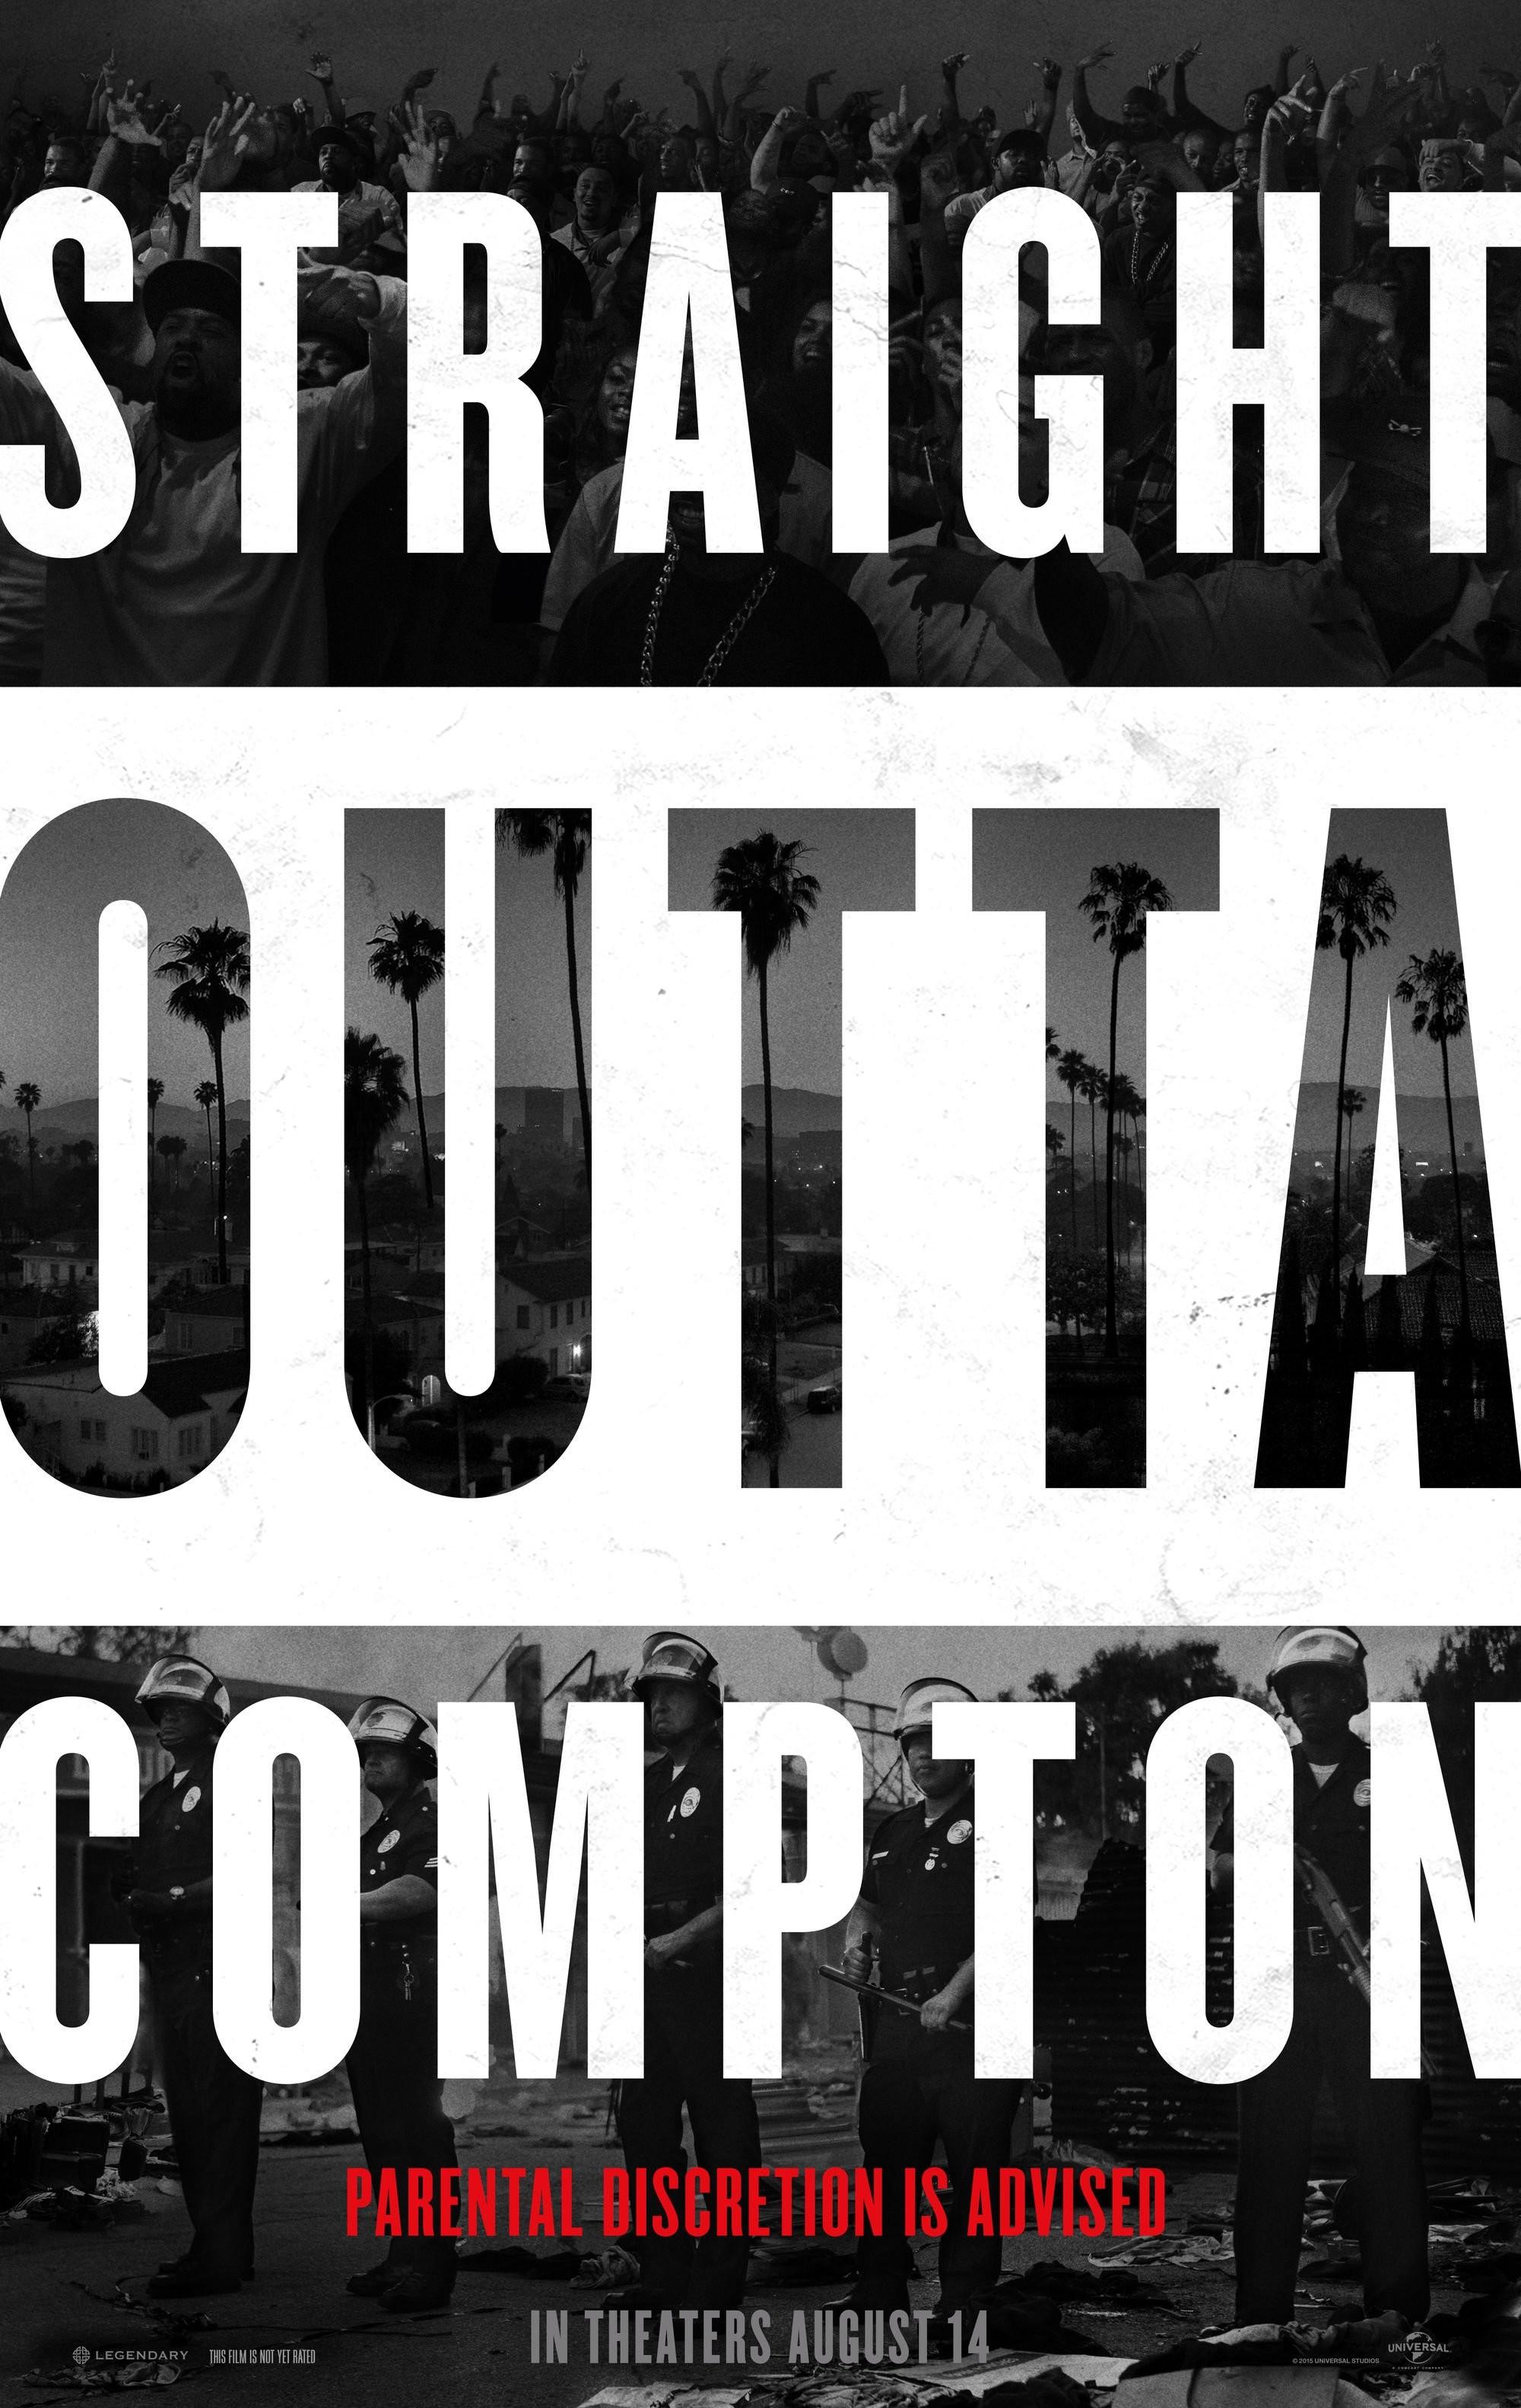 STRAIGHT OUTTA COMPTON rap rapper hip hop gangsta nwa biography drama music  1soc poster wallpaper | | 789278 | WallpaperUP